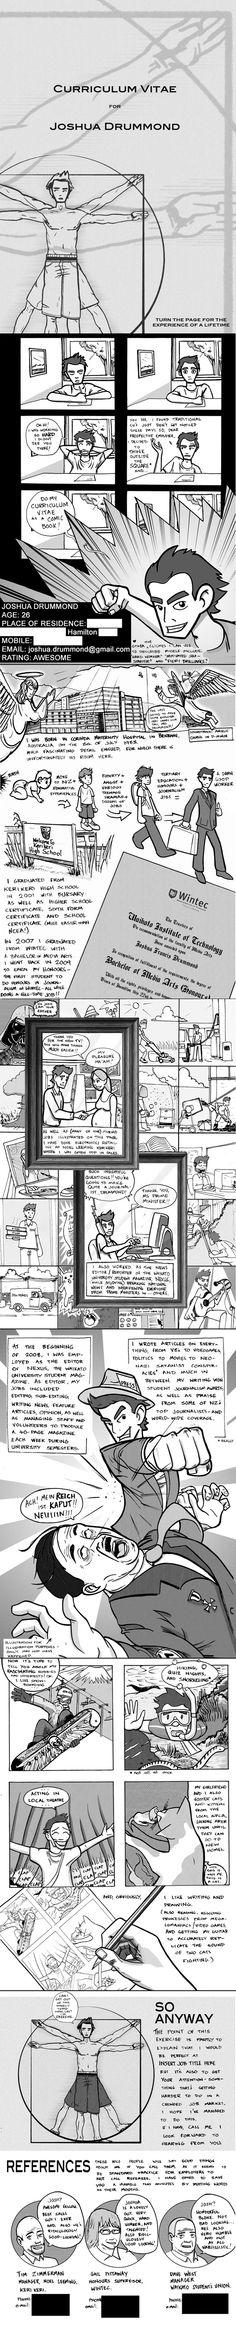 comic book resume by ~maverickcarter on deviantART